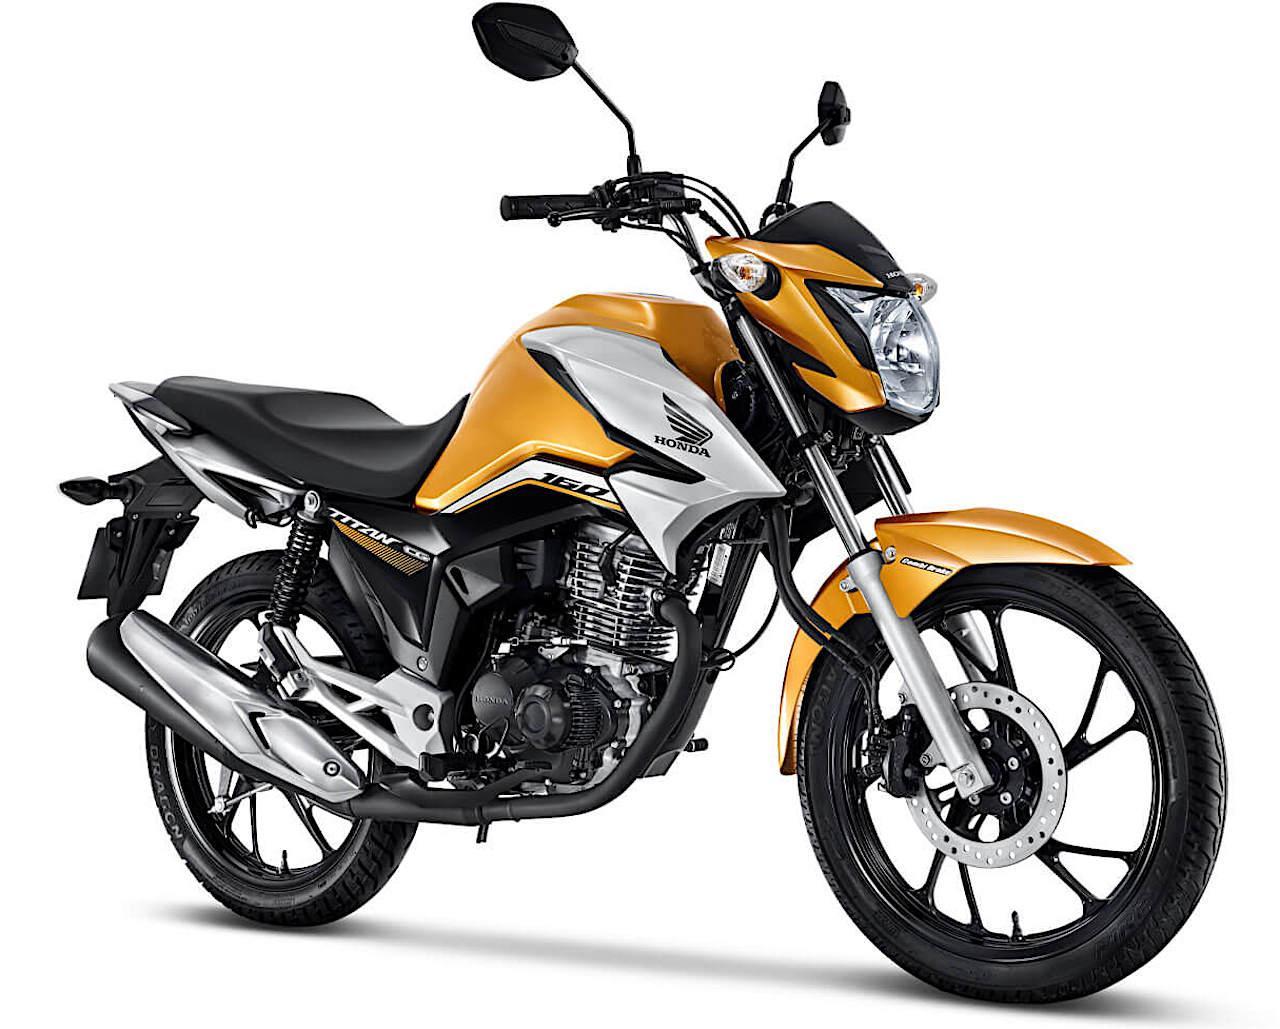 画像: Honda CG160 Titan